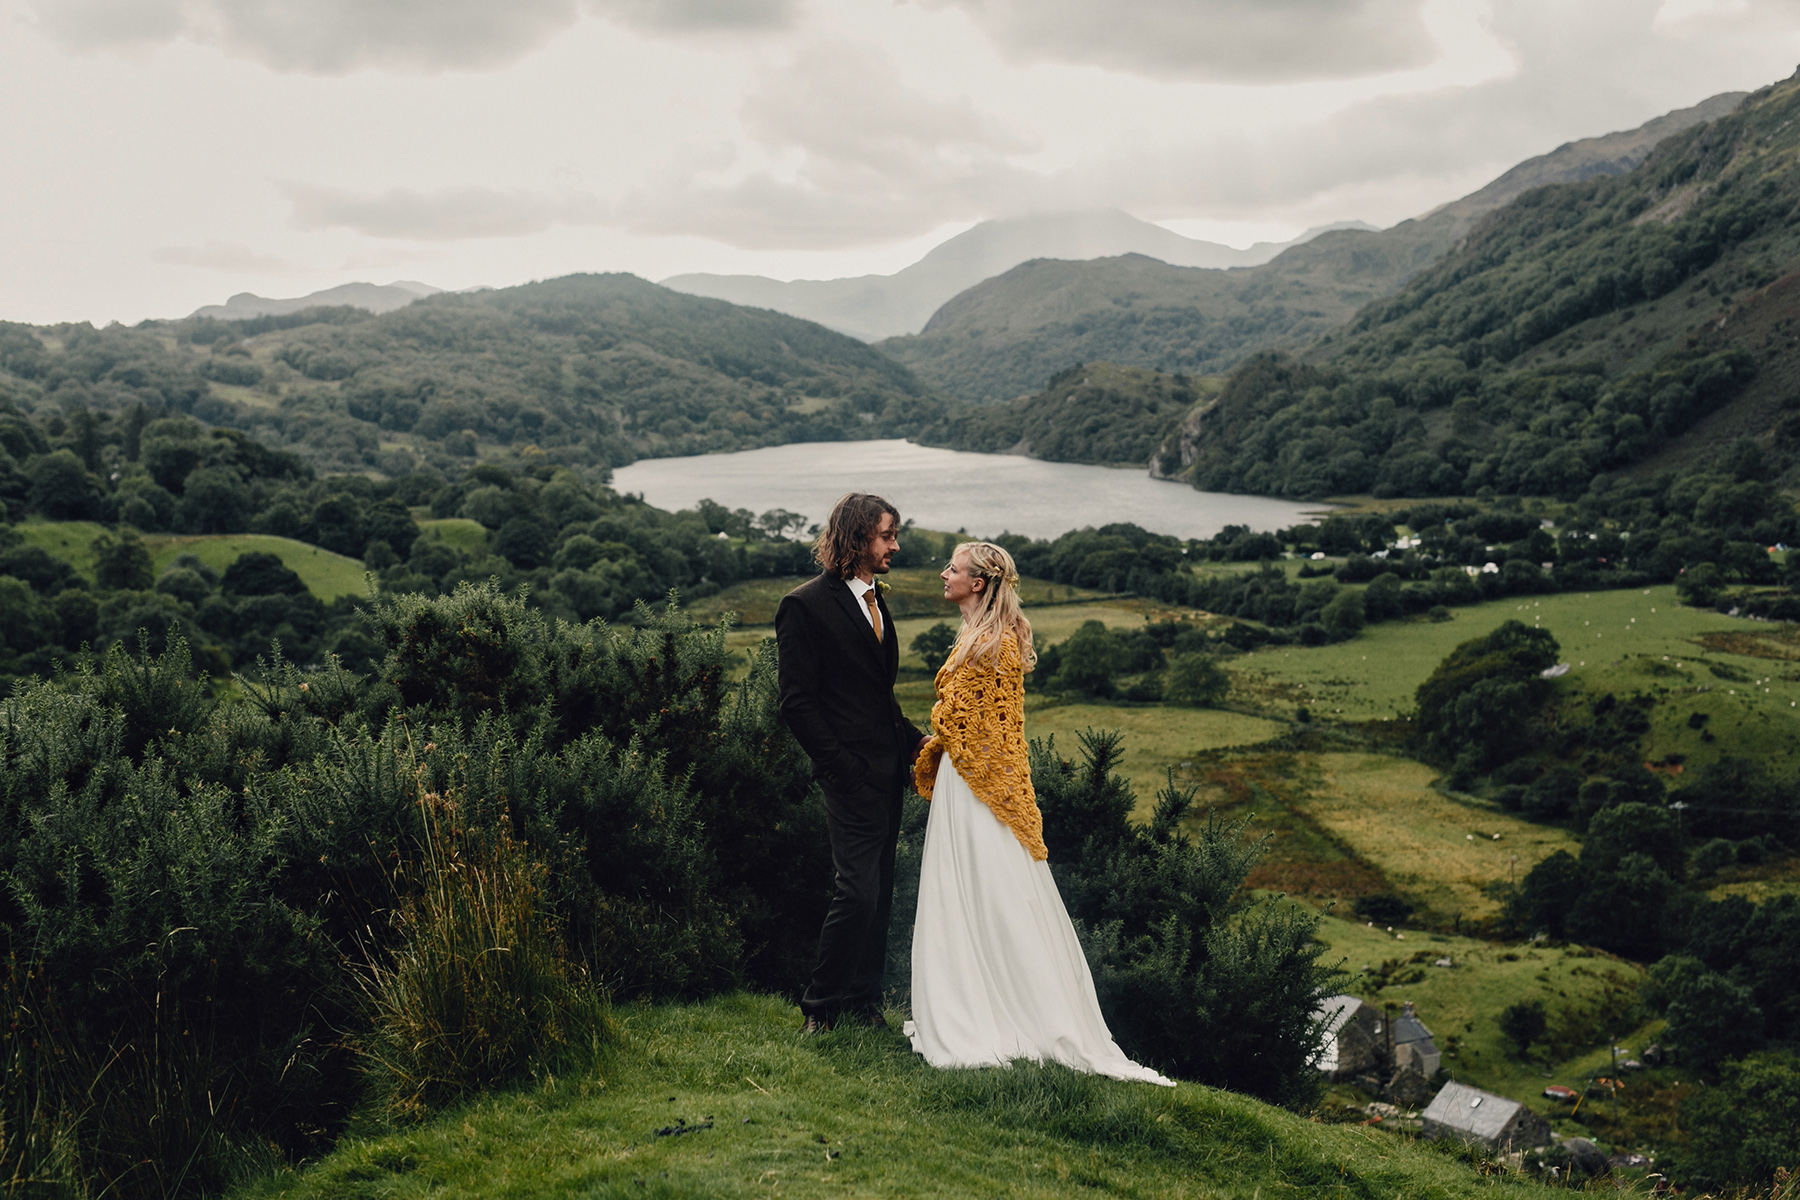 Snowdonia-Wales-Wedding-Photos-0365.jpg